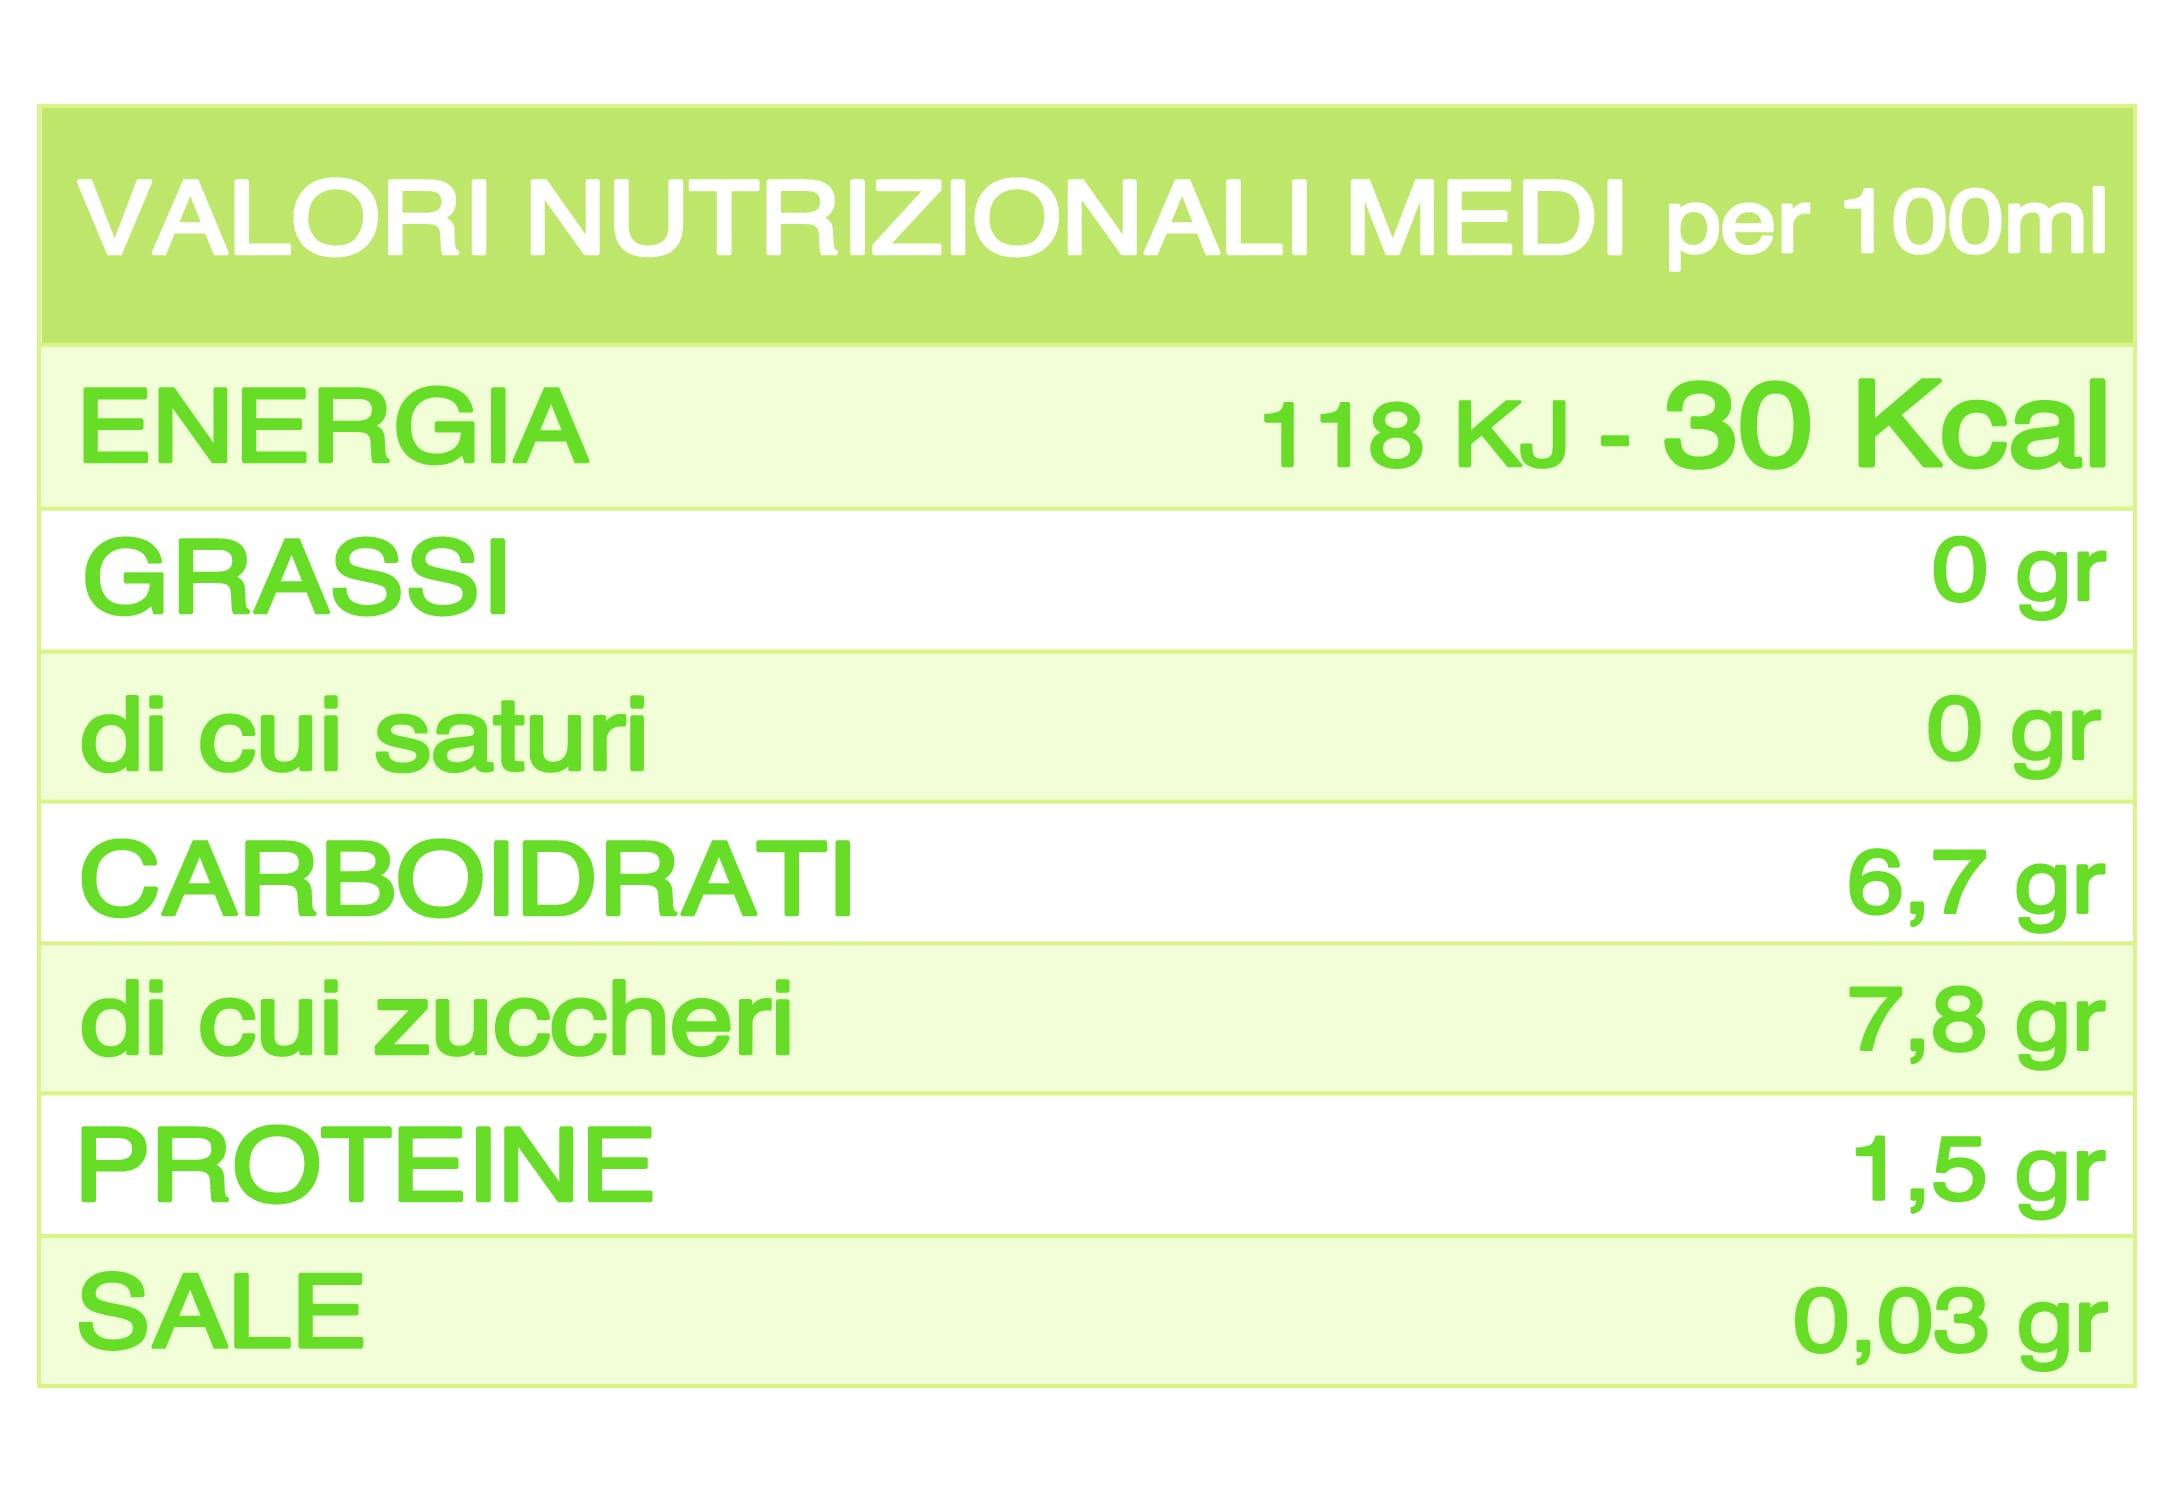 IMMUNITY TABELLE NUTRIZIONALI-min